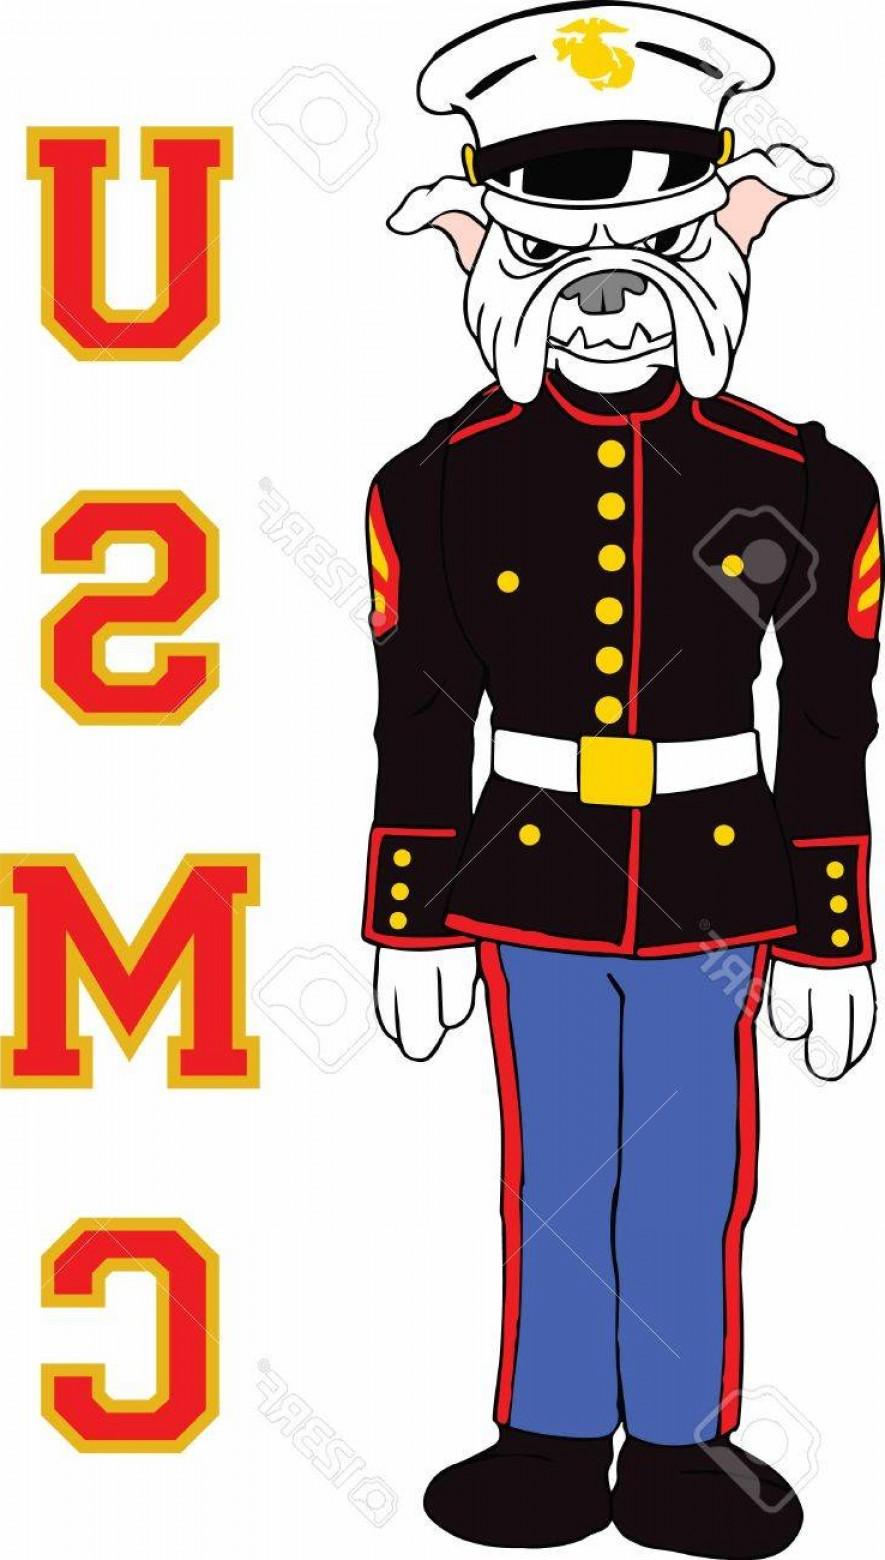 885x1560 Photostock Vector Marines Can Show Their Pride With A Bulldog Logo